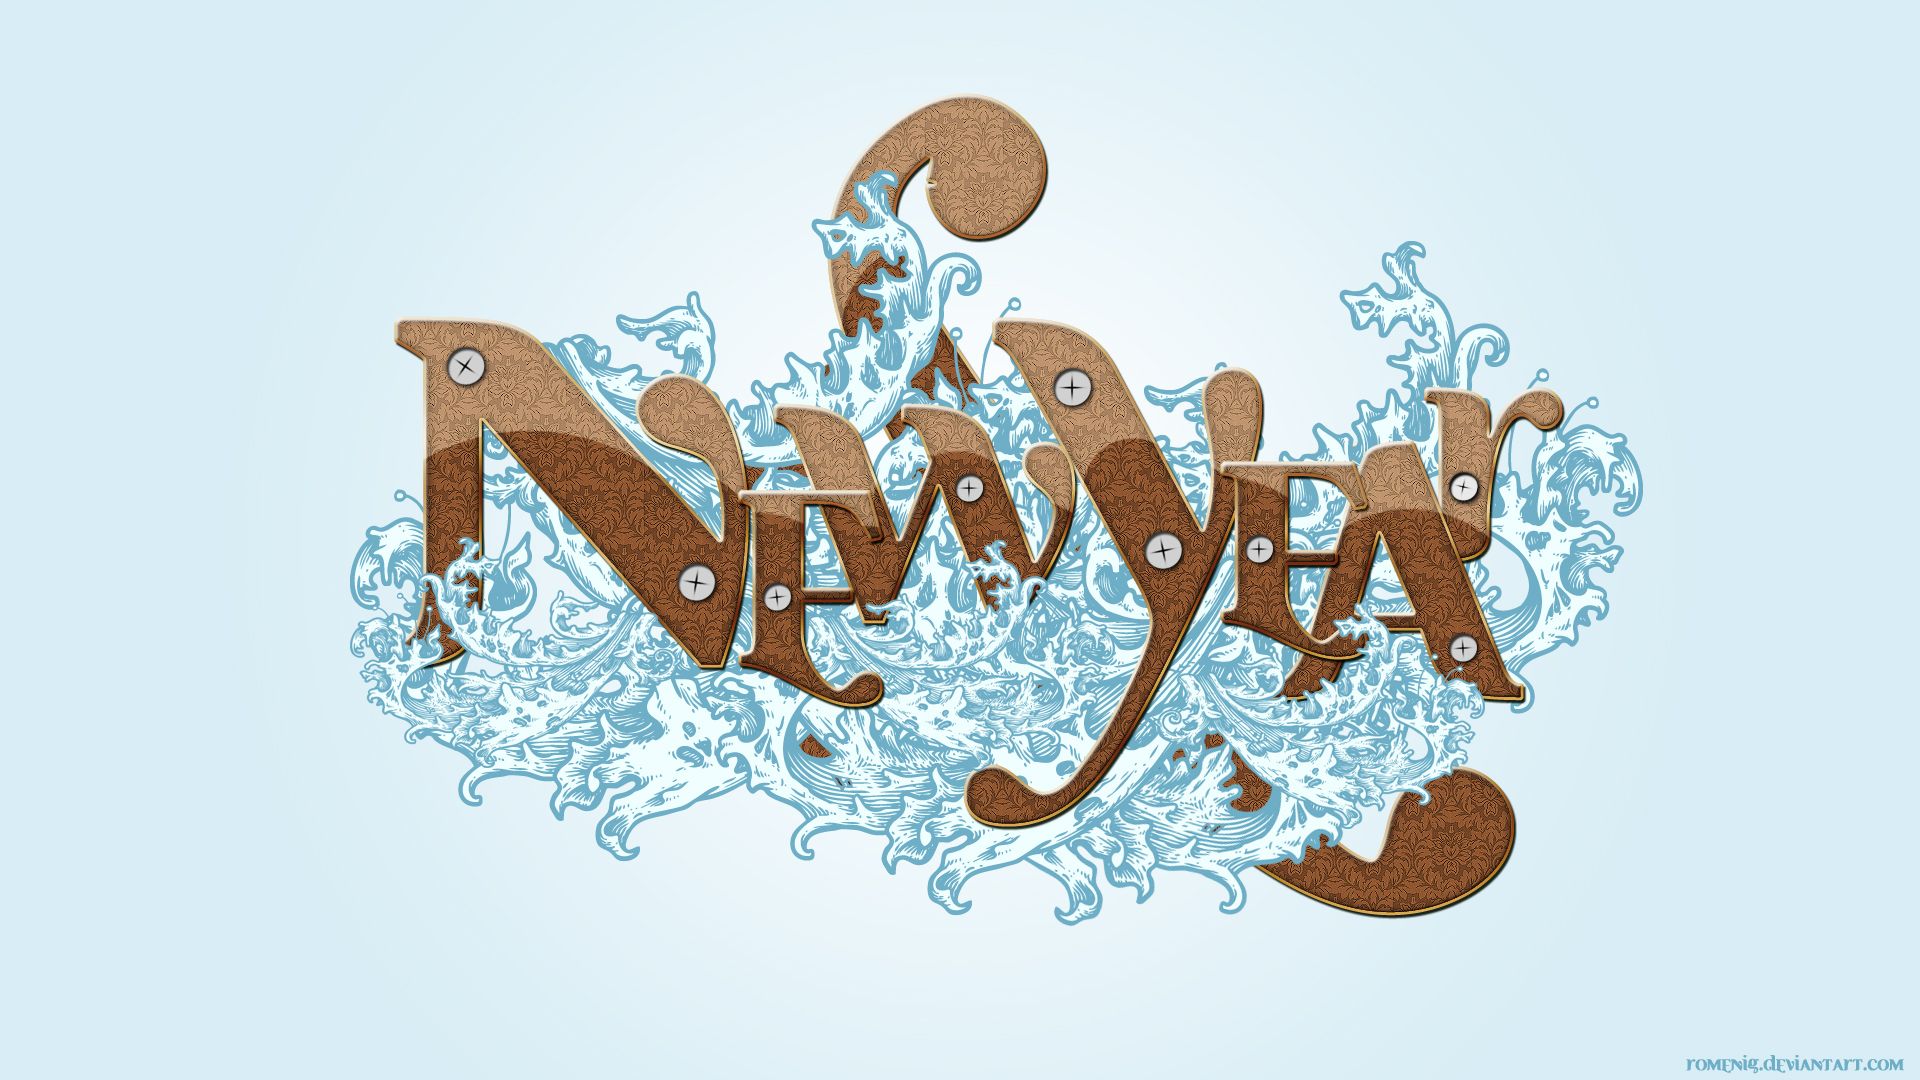 New Year by Romenig